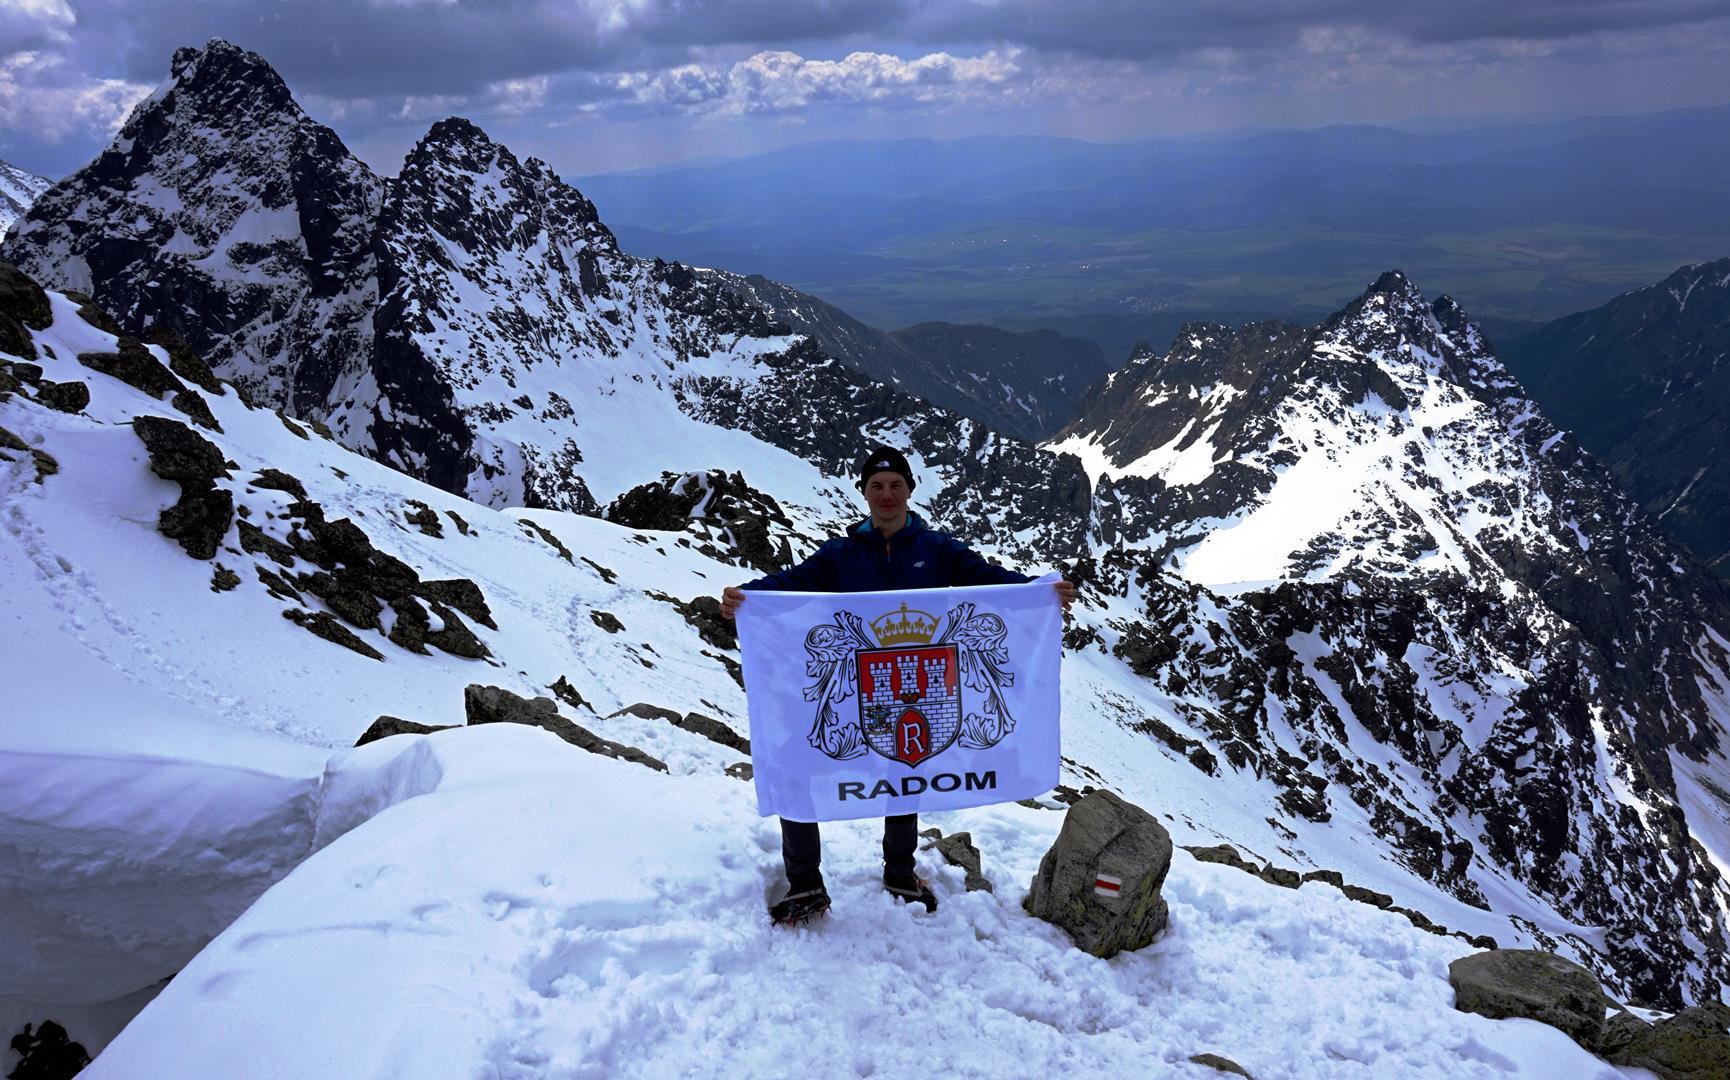 szczyt rysy 2499 m n.p.m.